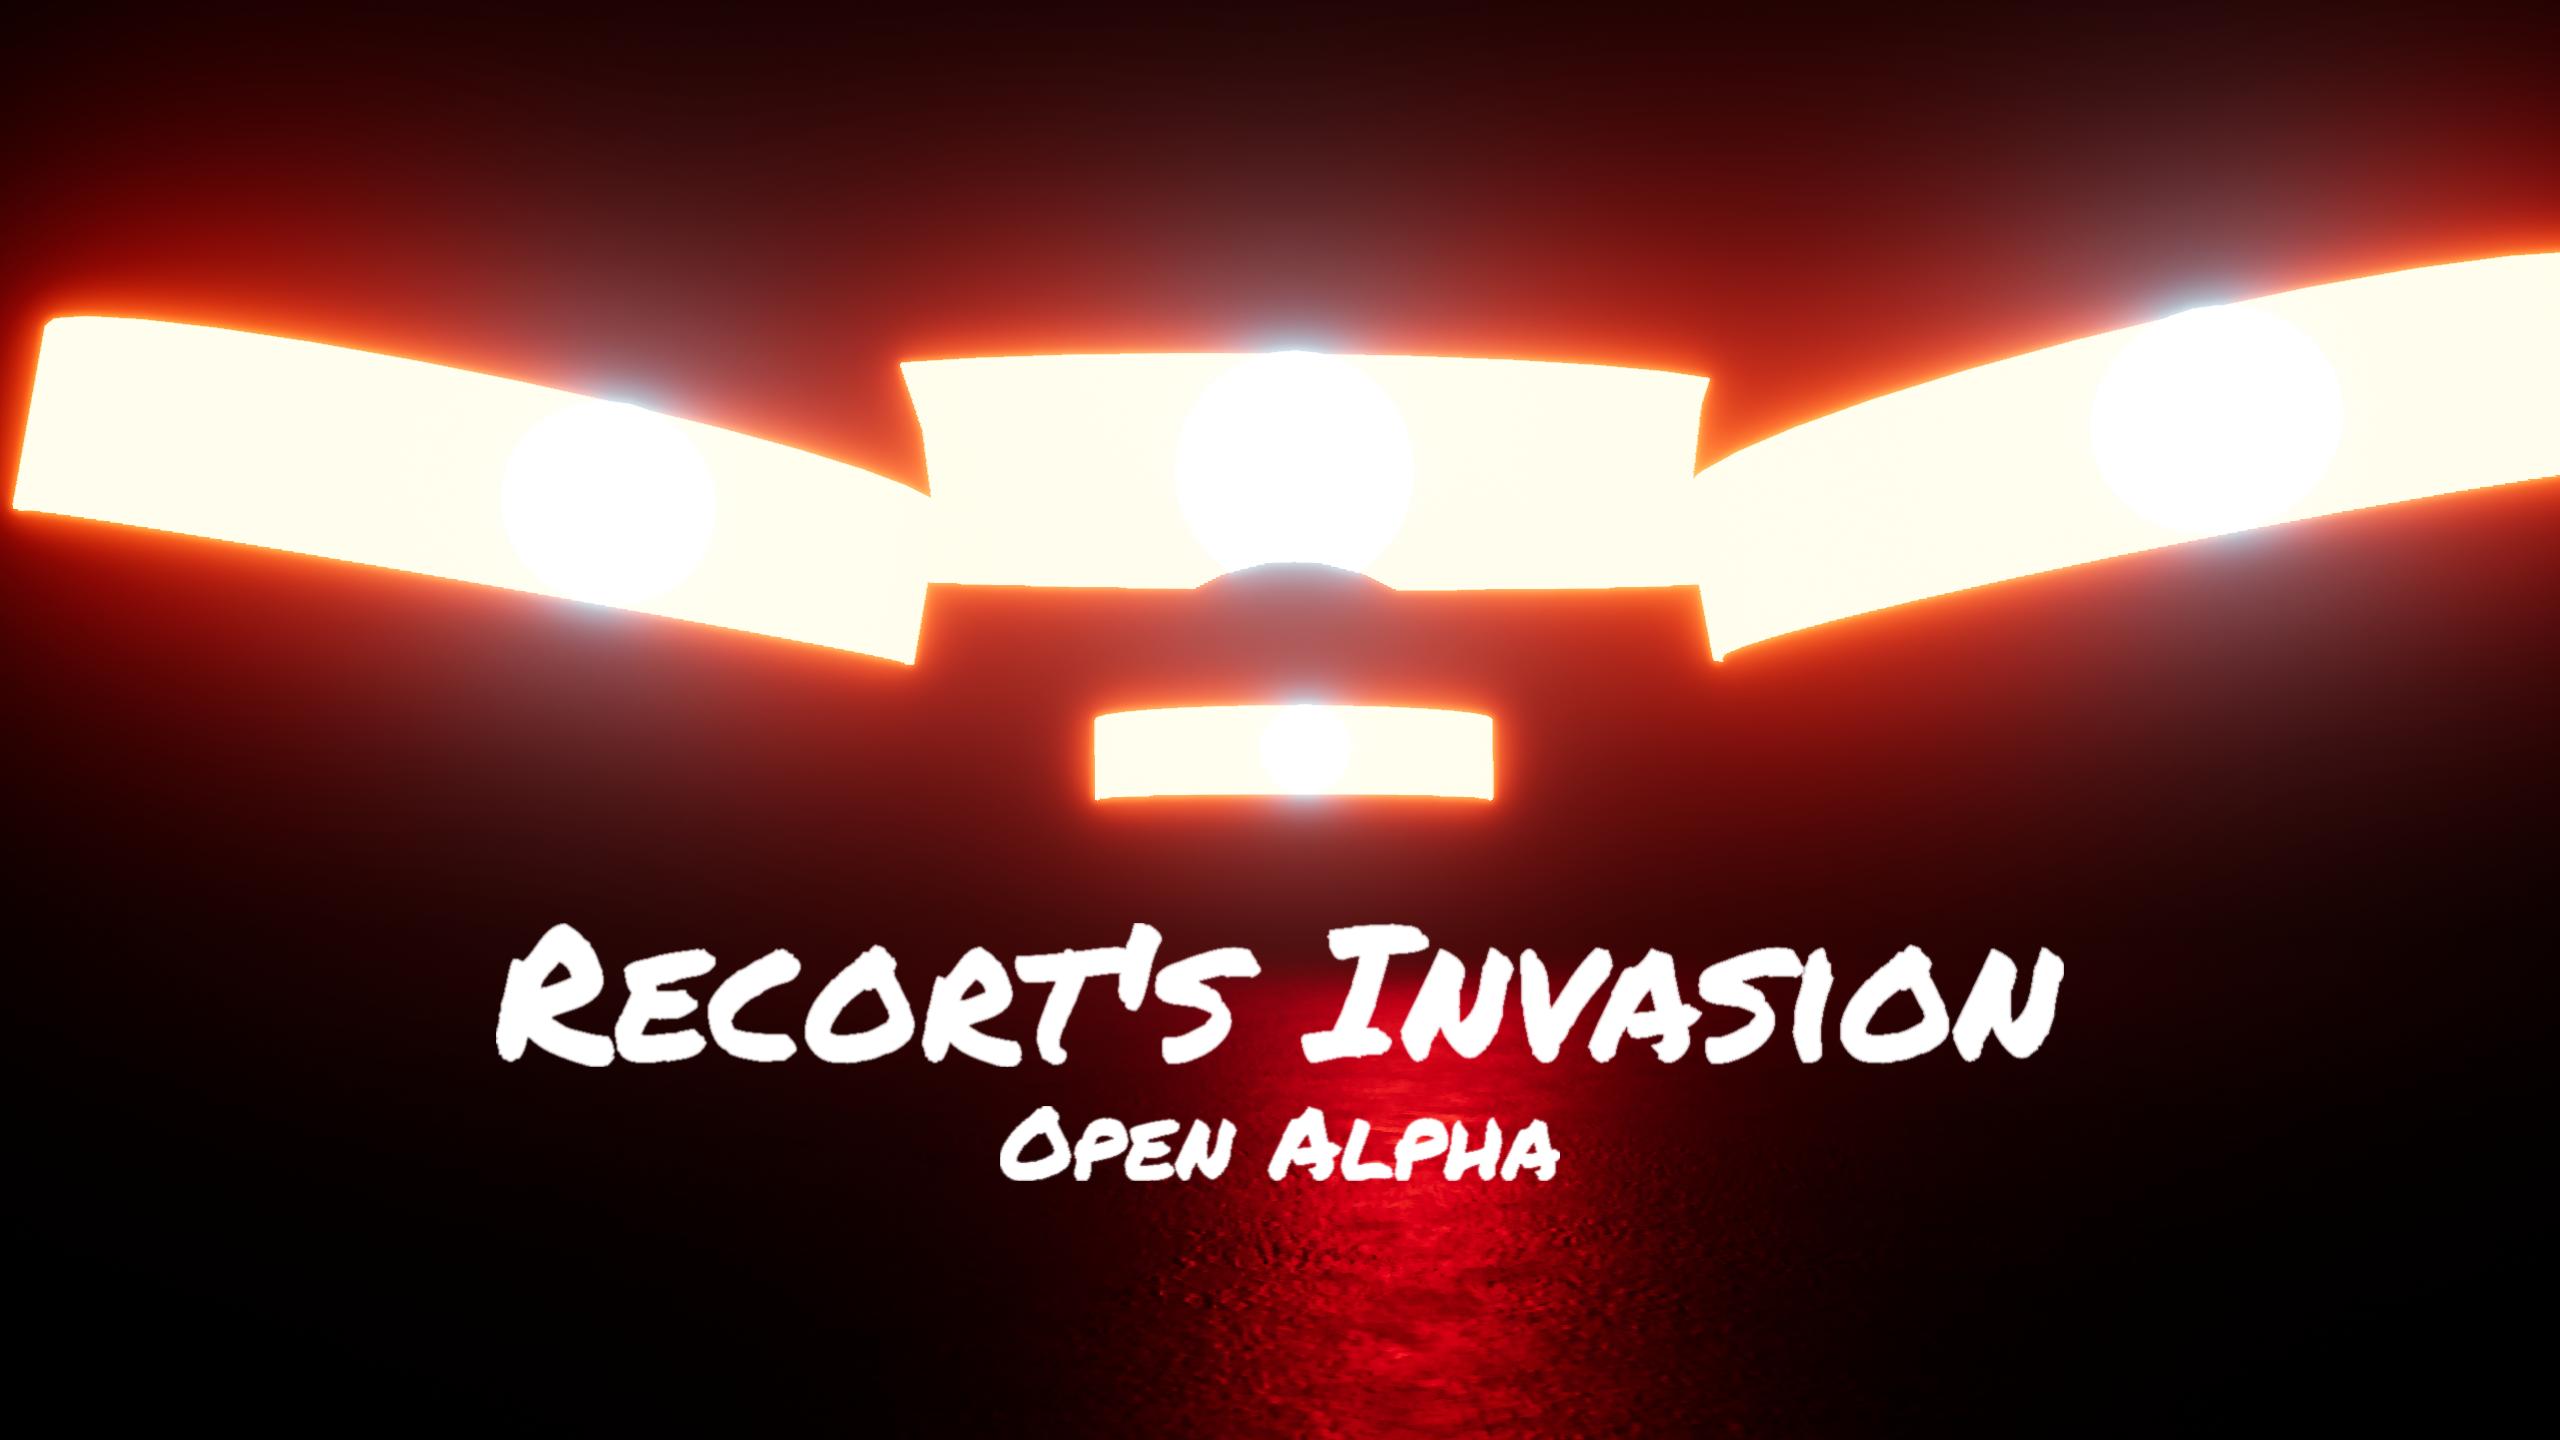 Recort's Invasion